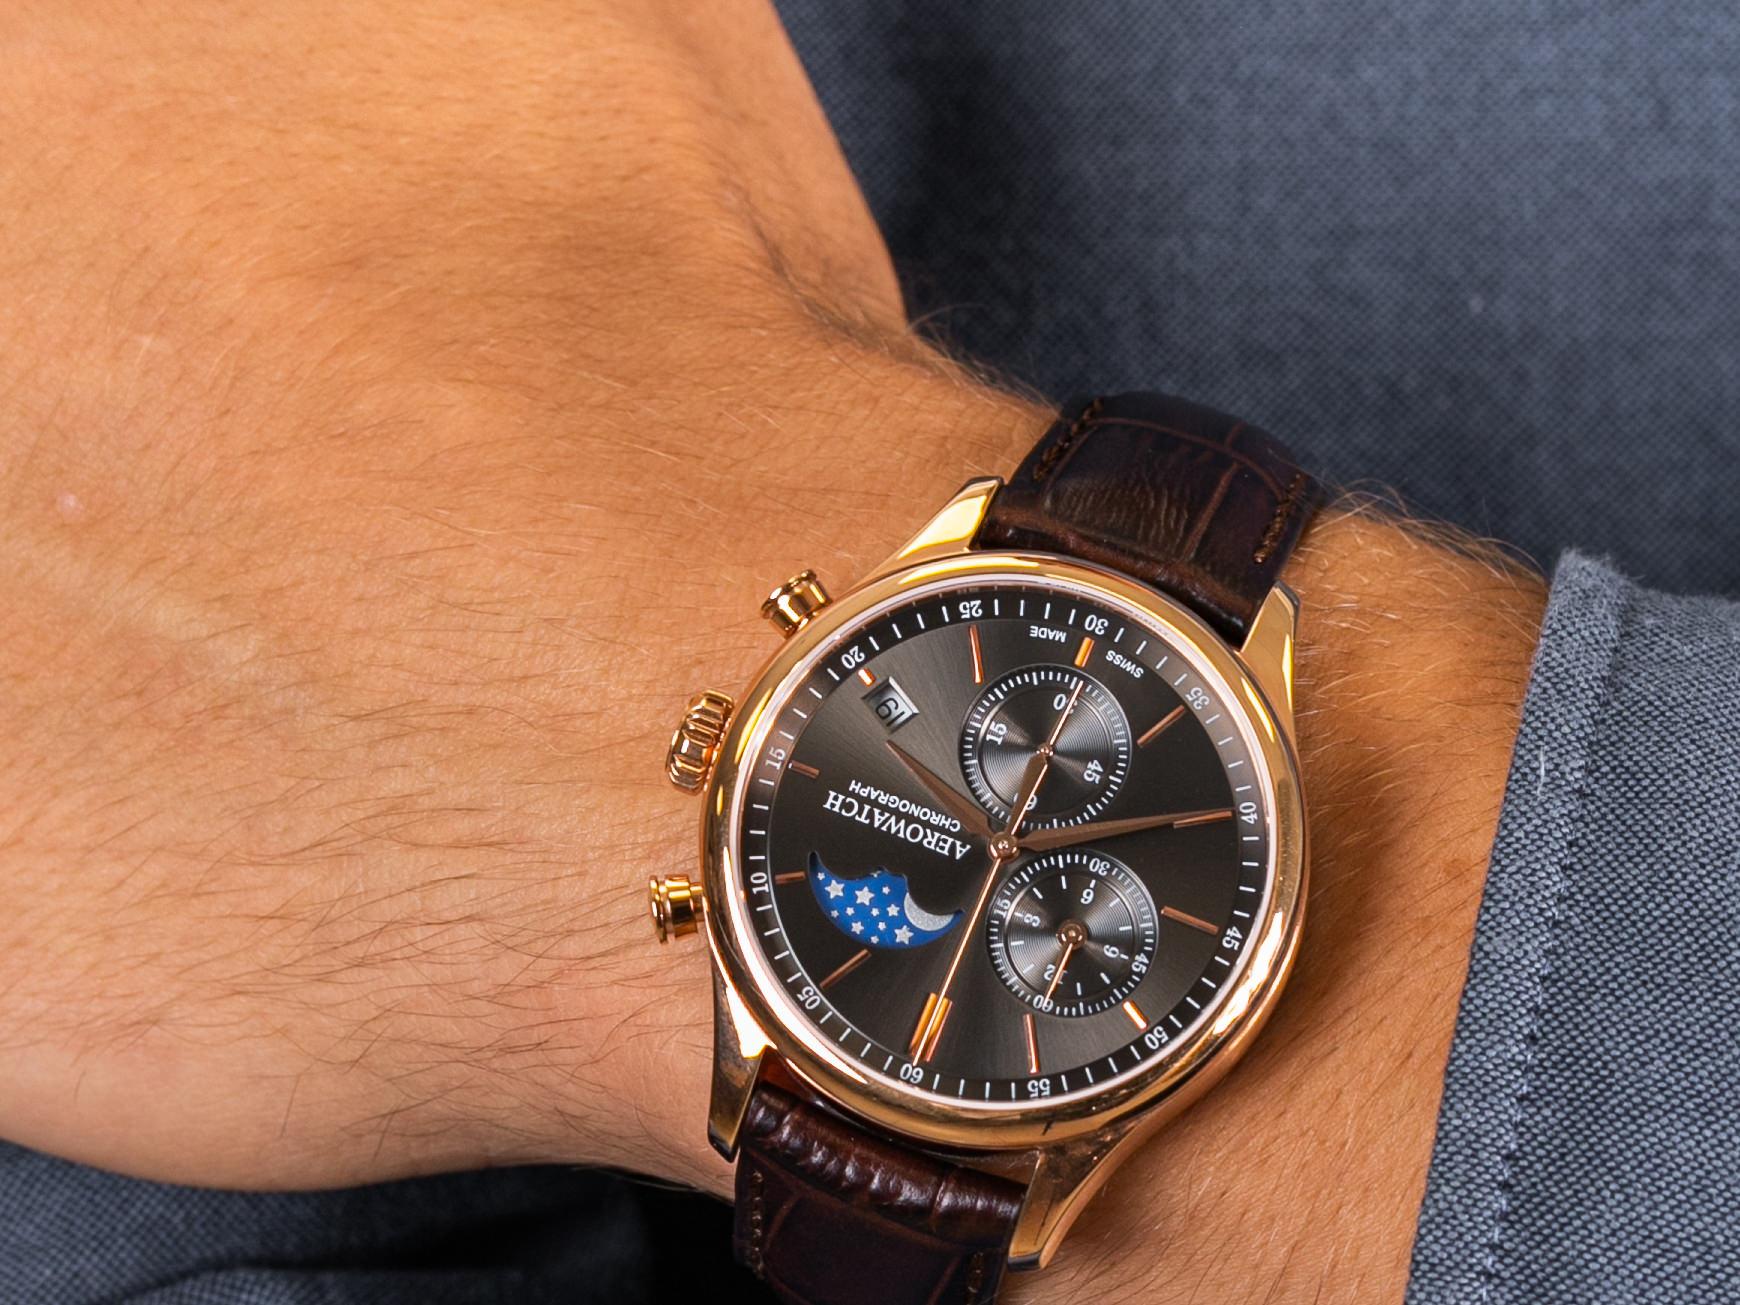 Aerowatch 78986-RO02 RENAISSANCE CHRONO MOON PHASES zegarek klasyczny Renaissance